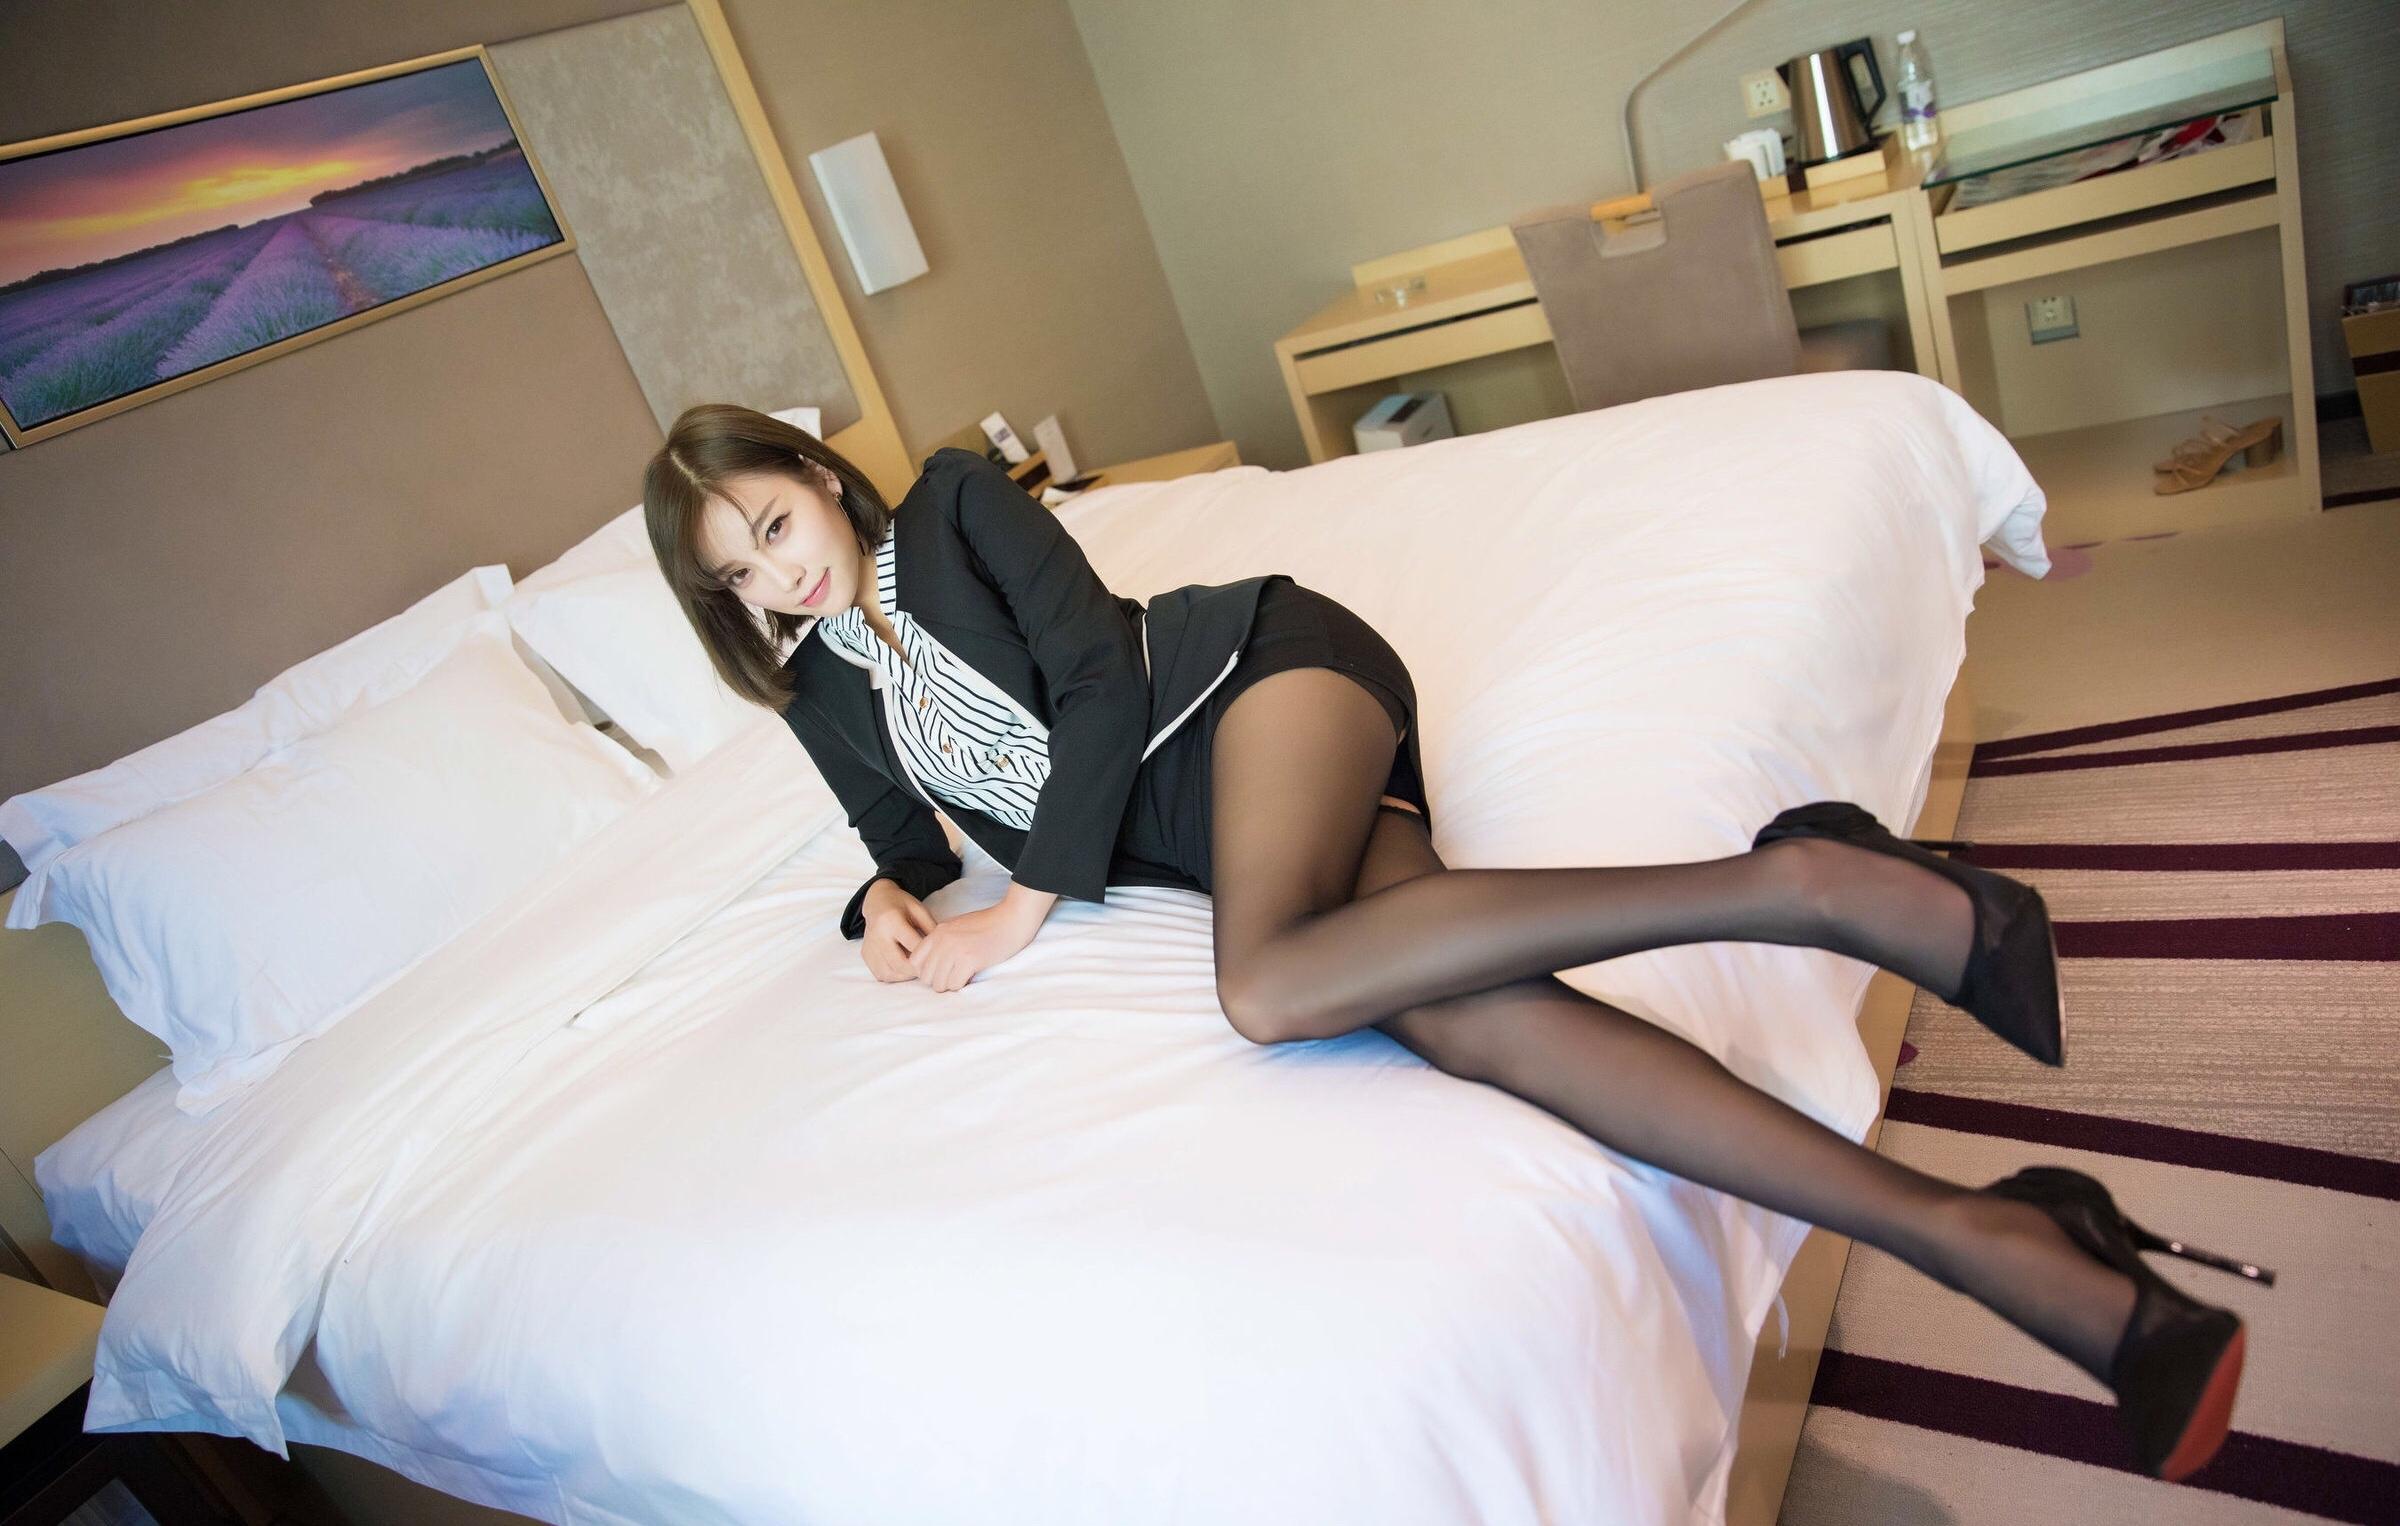 OL姿で誘惑してくるsugar杨晨晨 15